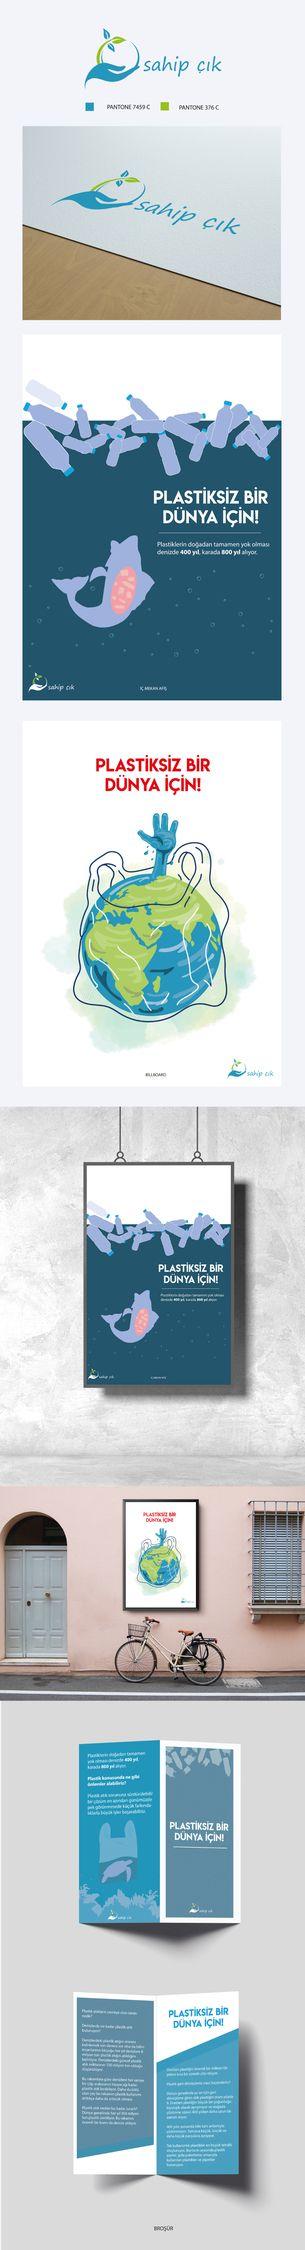 World Plastic - rabiaulutas | ello